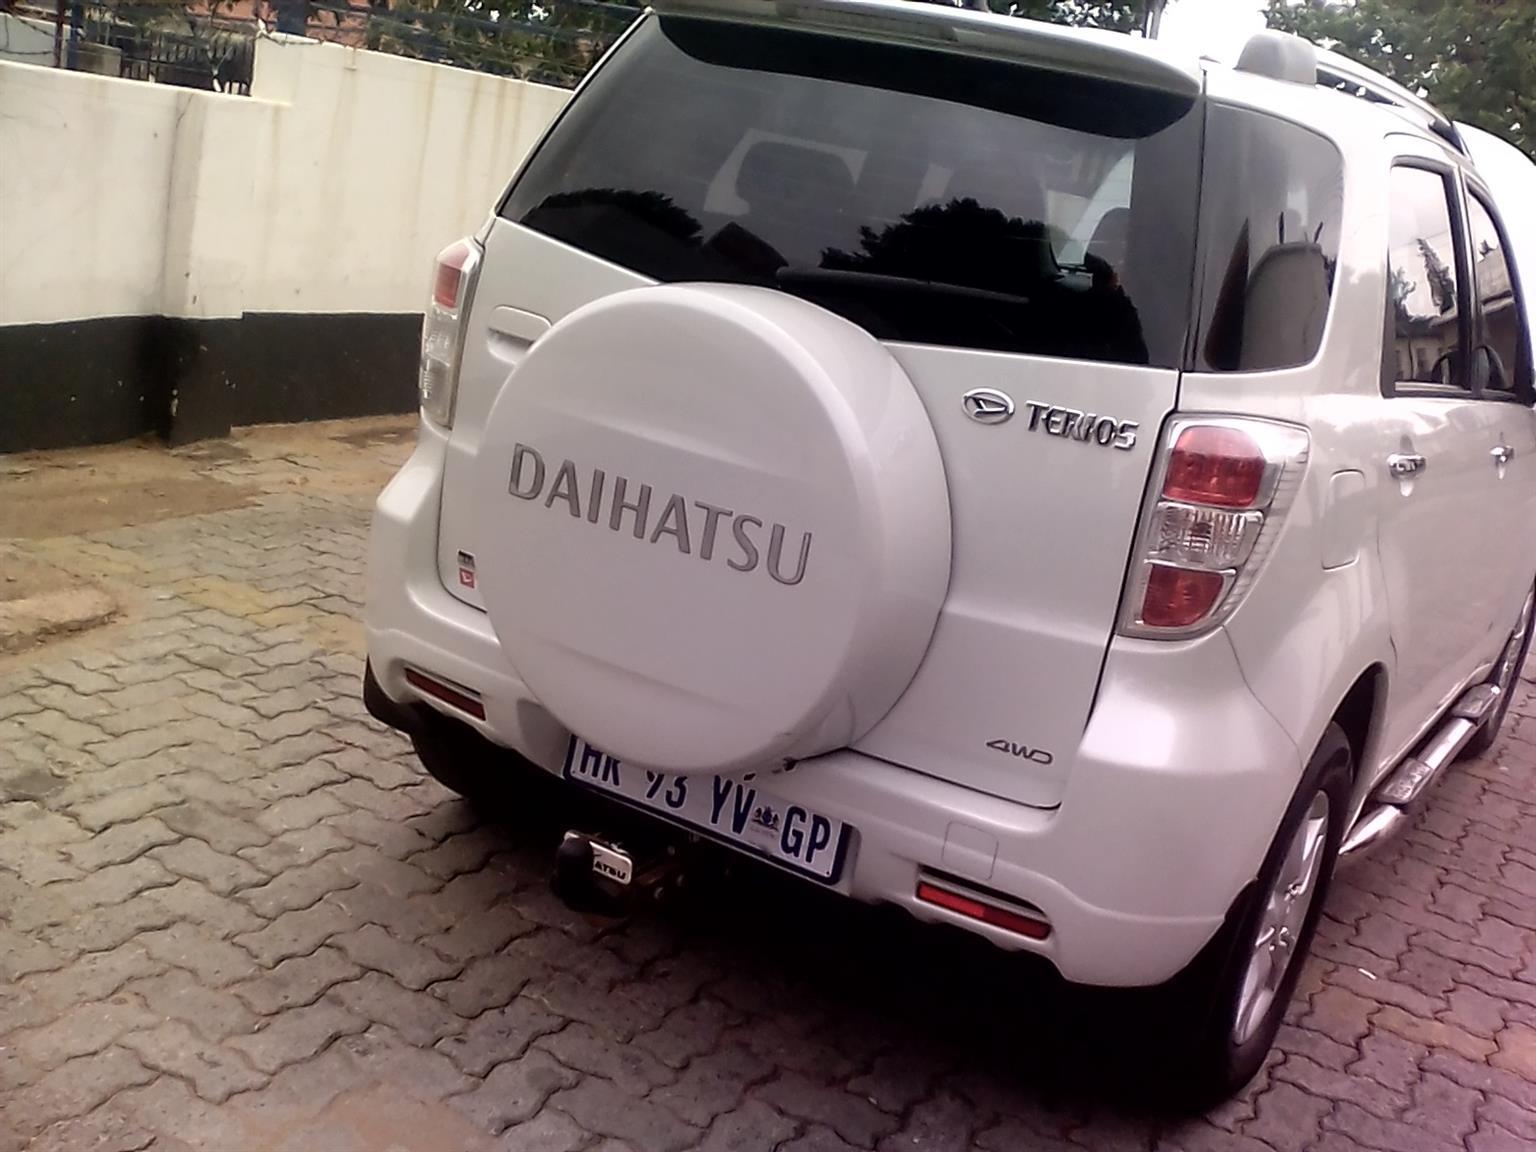 2014 Daihatsu Terios 1.5 4x4 auto